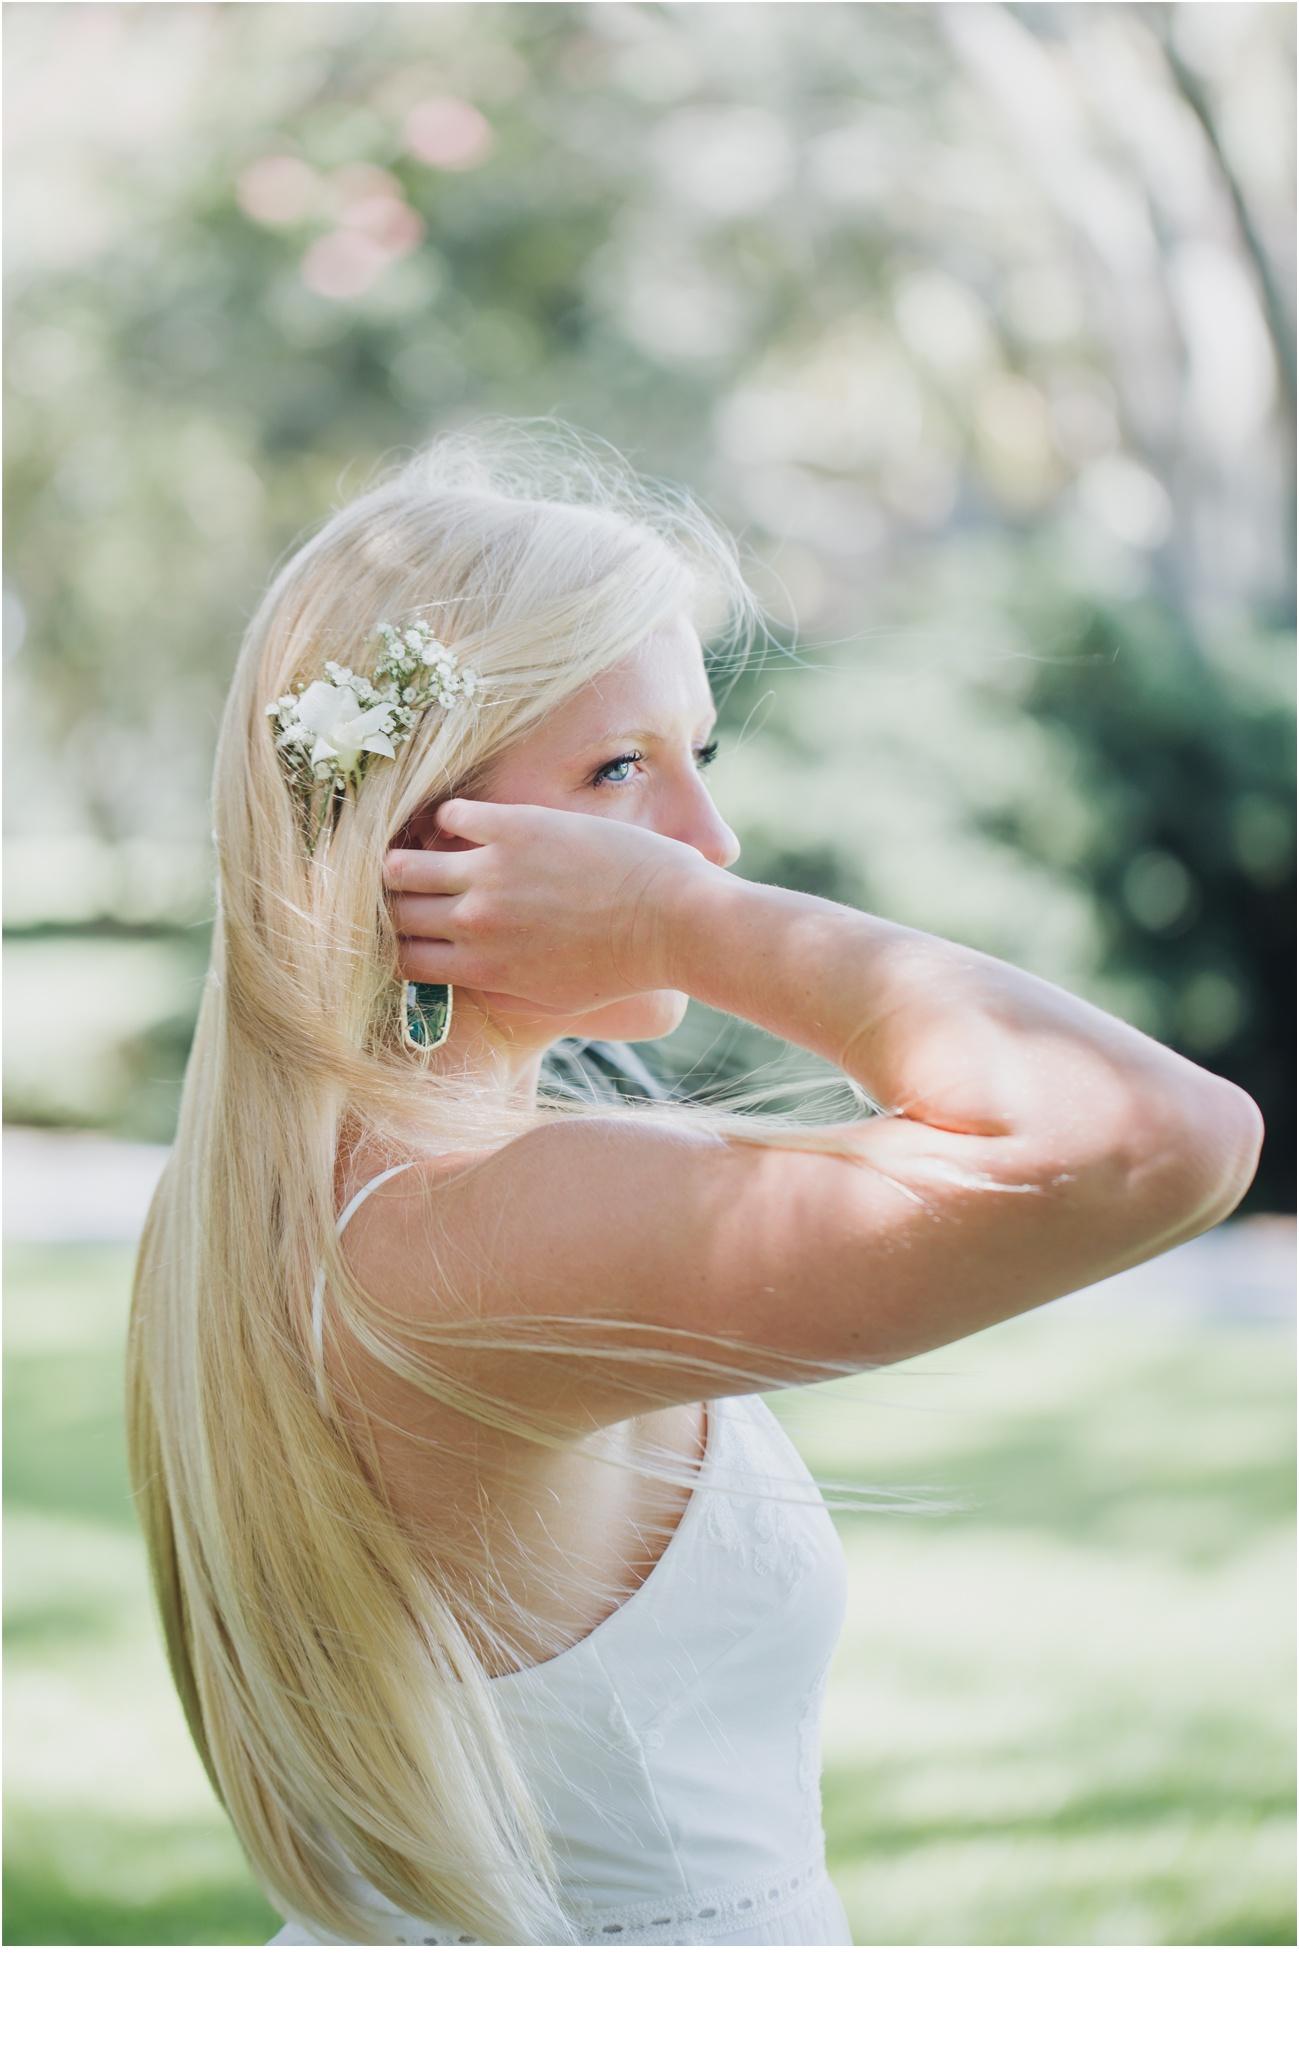 Rainey_Gregg_Photography_St._Simons_Island_Georgia_California_Wedding_Portrait_Photography_1118.jpg